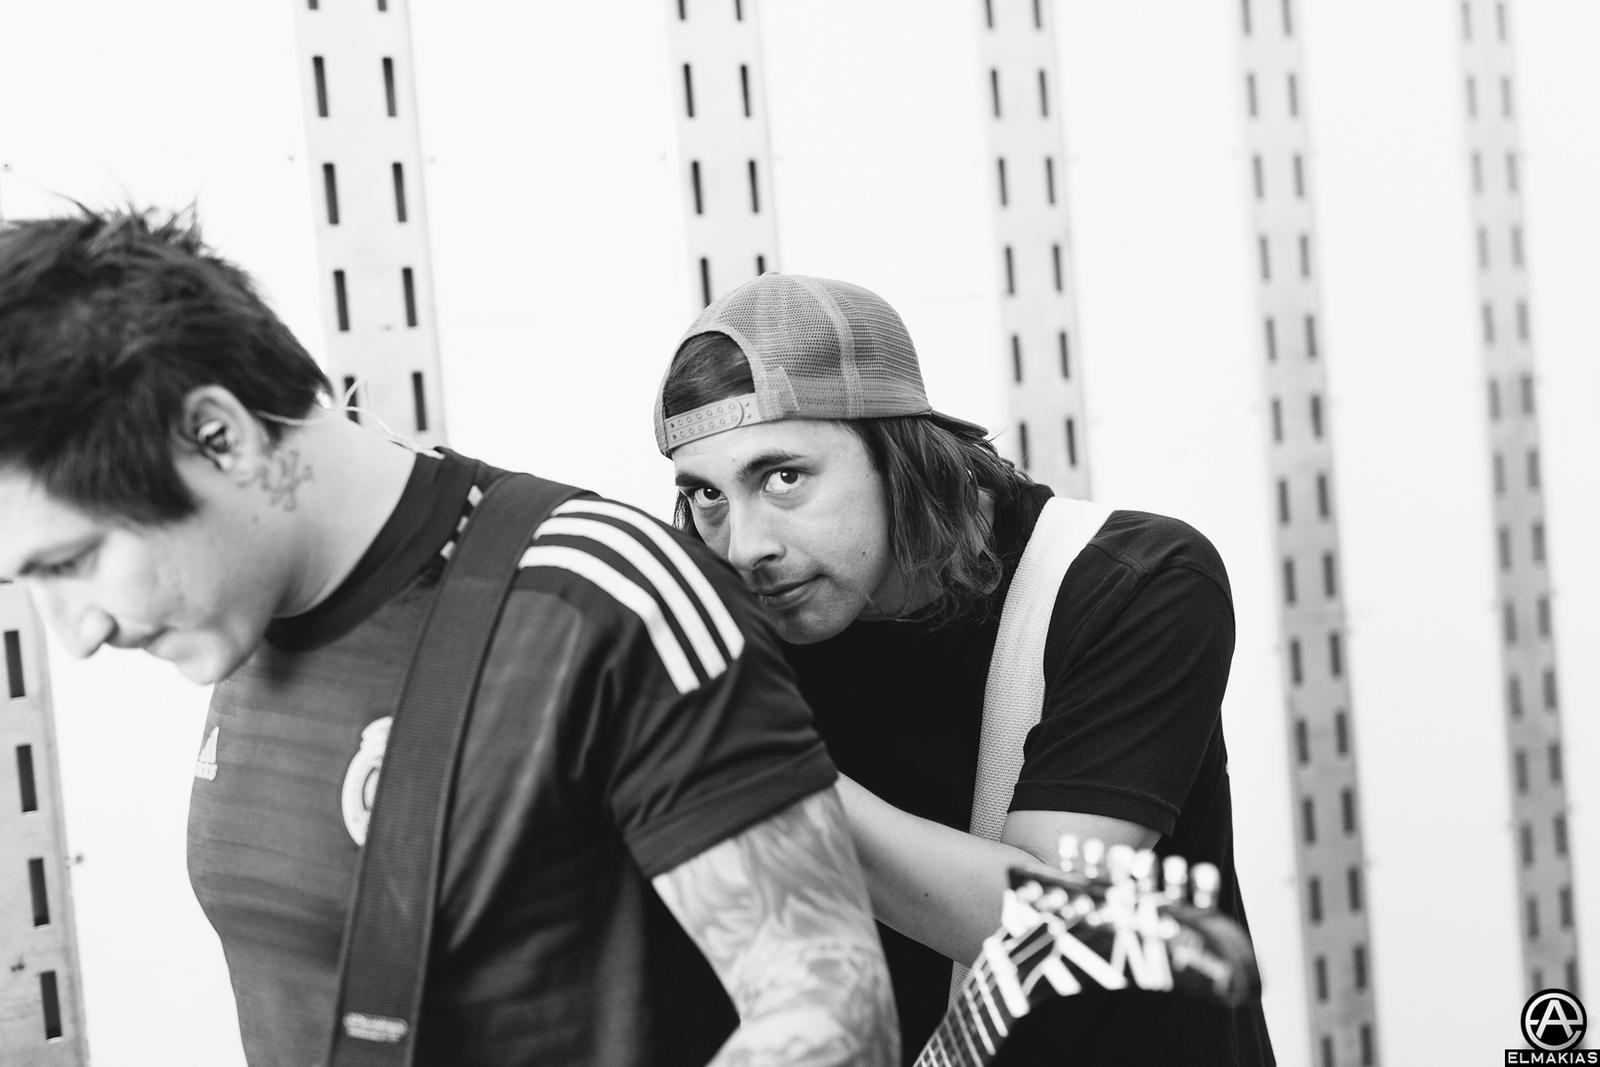 Jaime Preciado and Vic Fuentes of Pierce the Veil at Warped Tour 2015 by Adam Elmakias